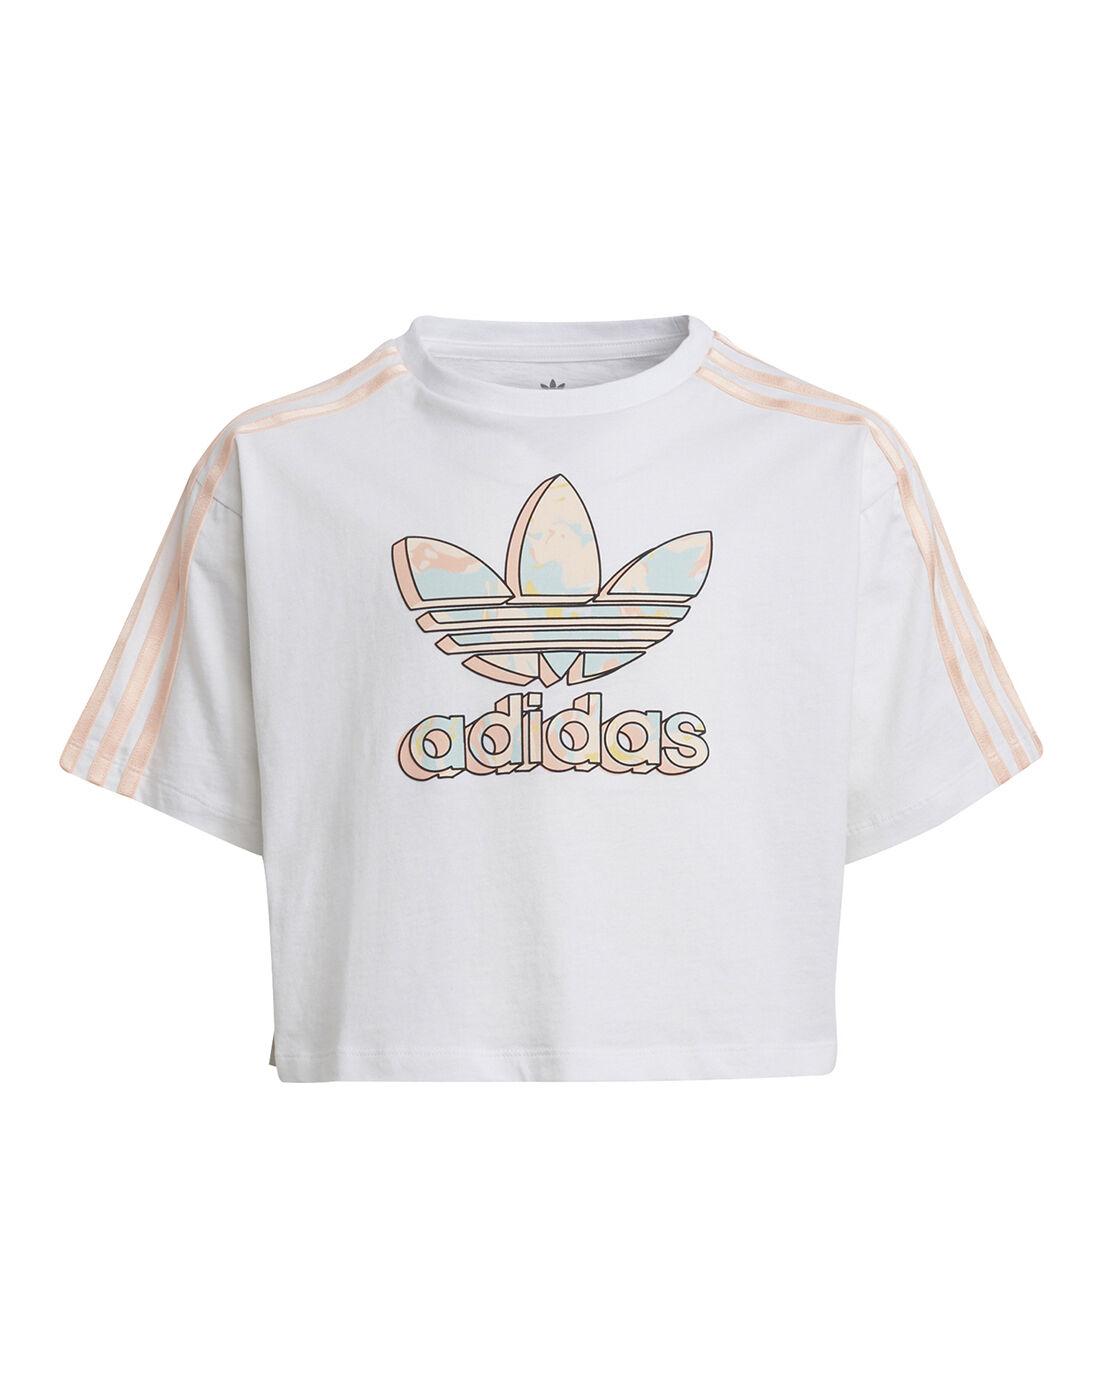 adidas Originals Older Girls Cropped T-Shirt - White   adidas ...